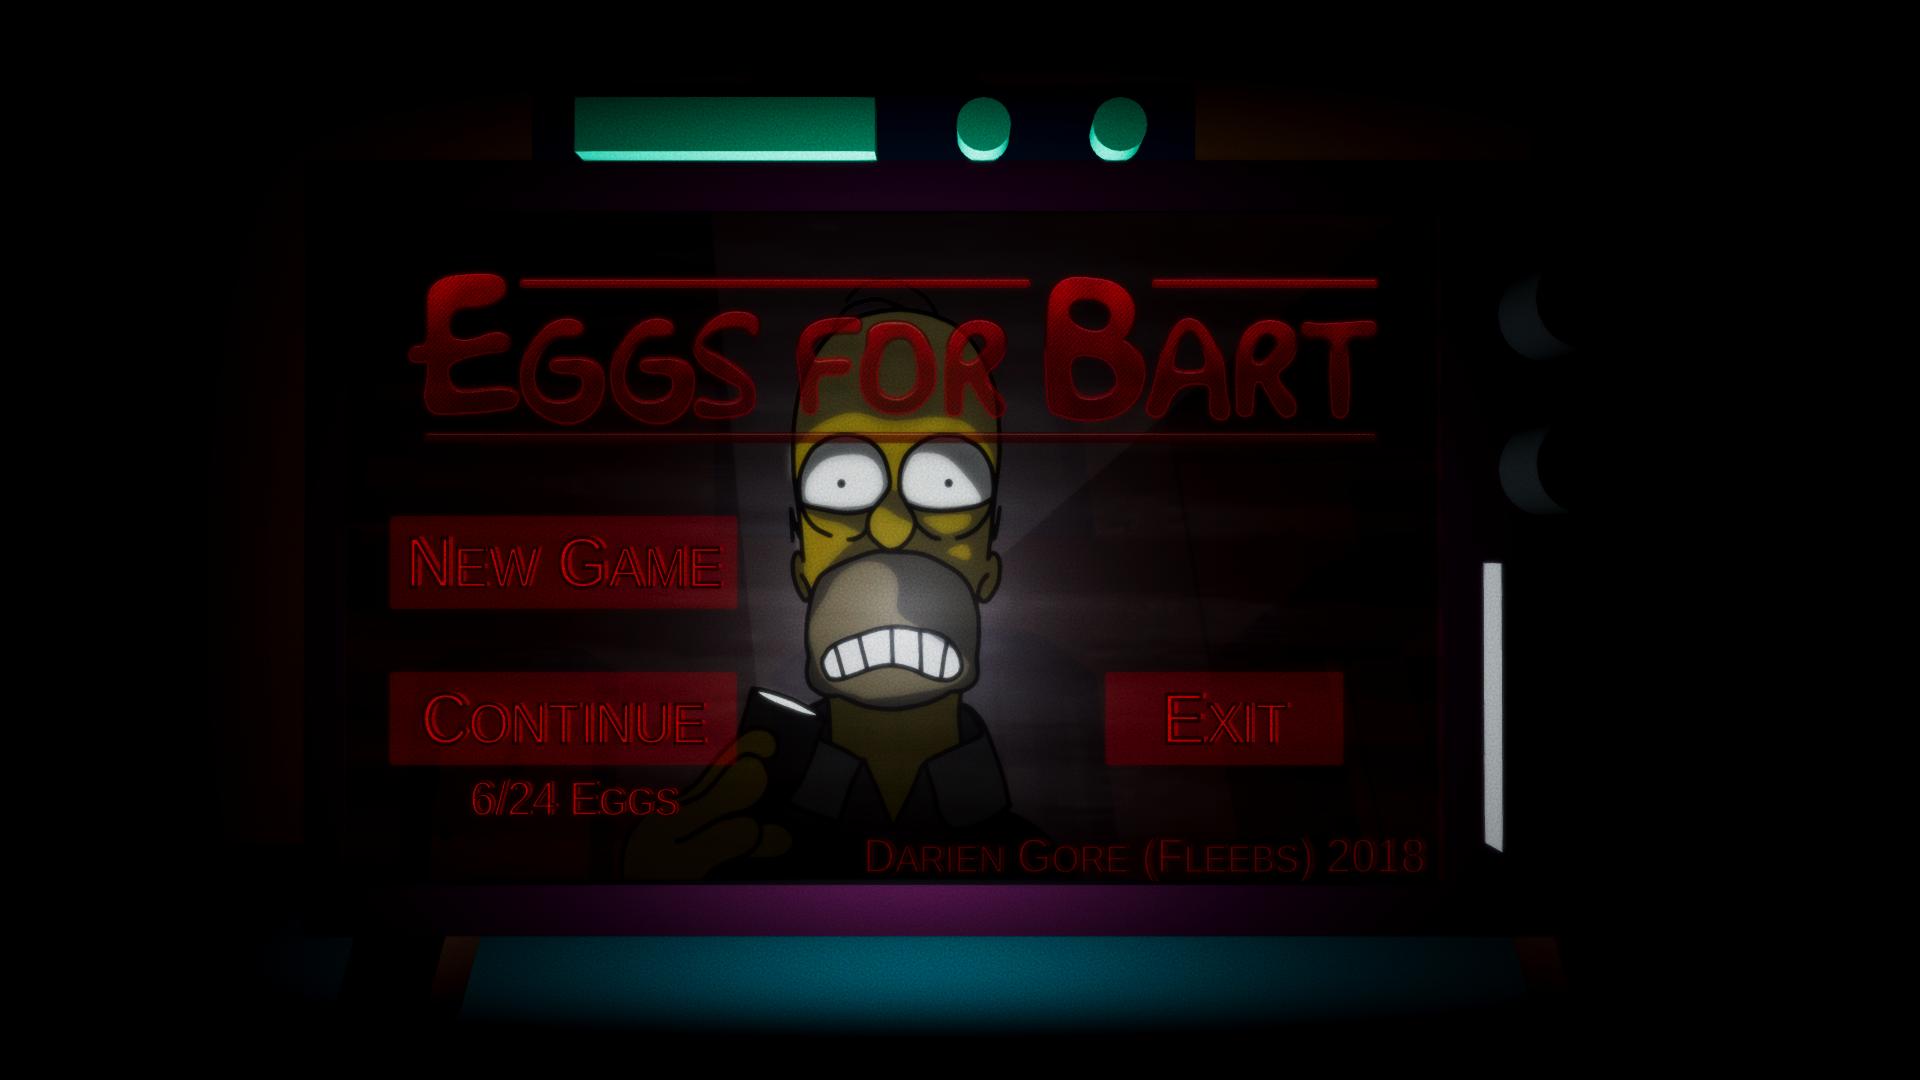 eggs for bart jacksepticeye wiki fandom powered by wikia